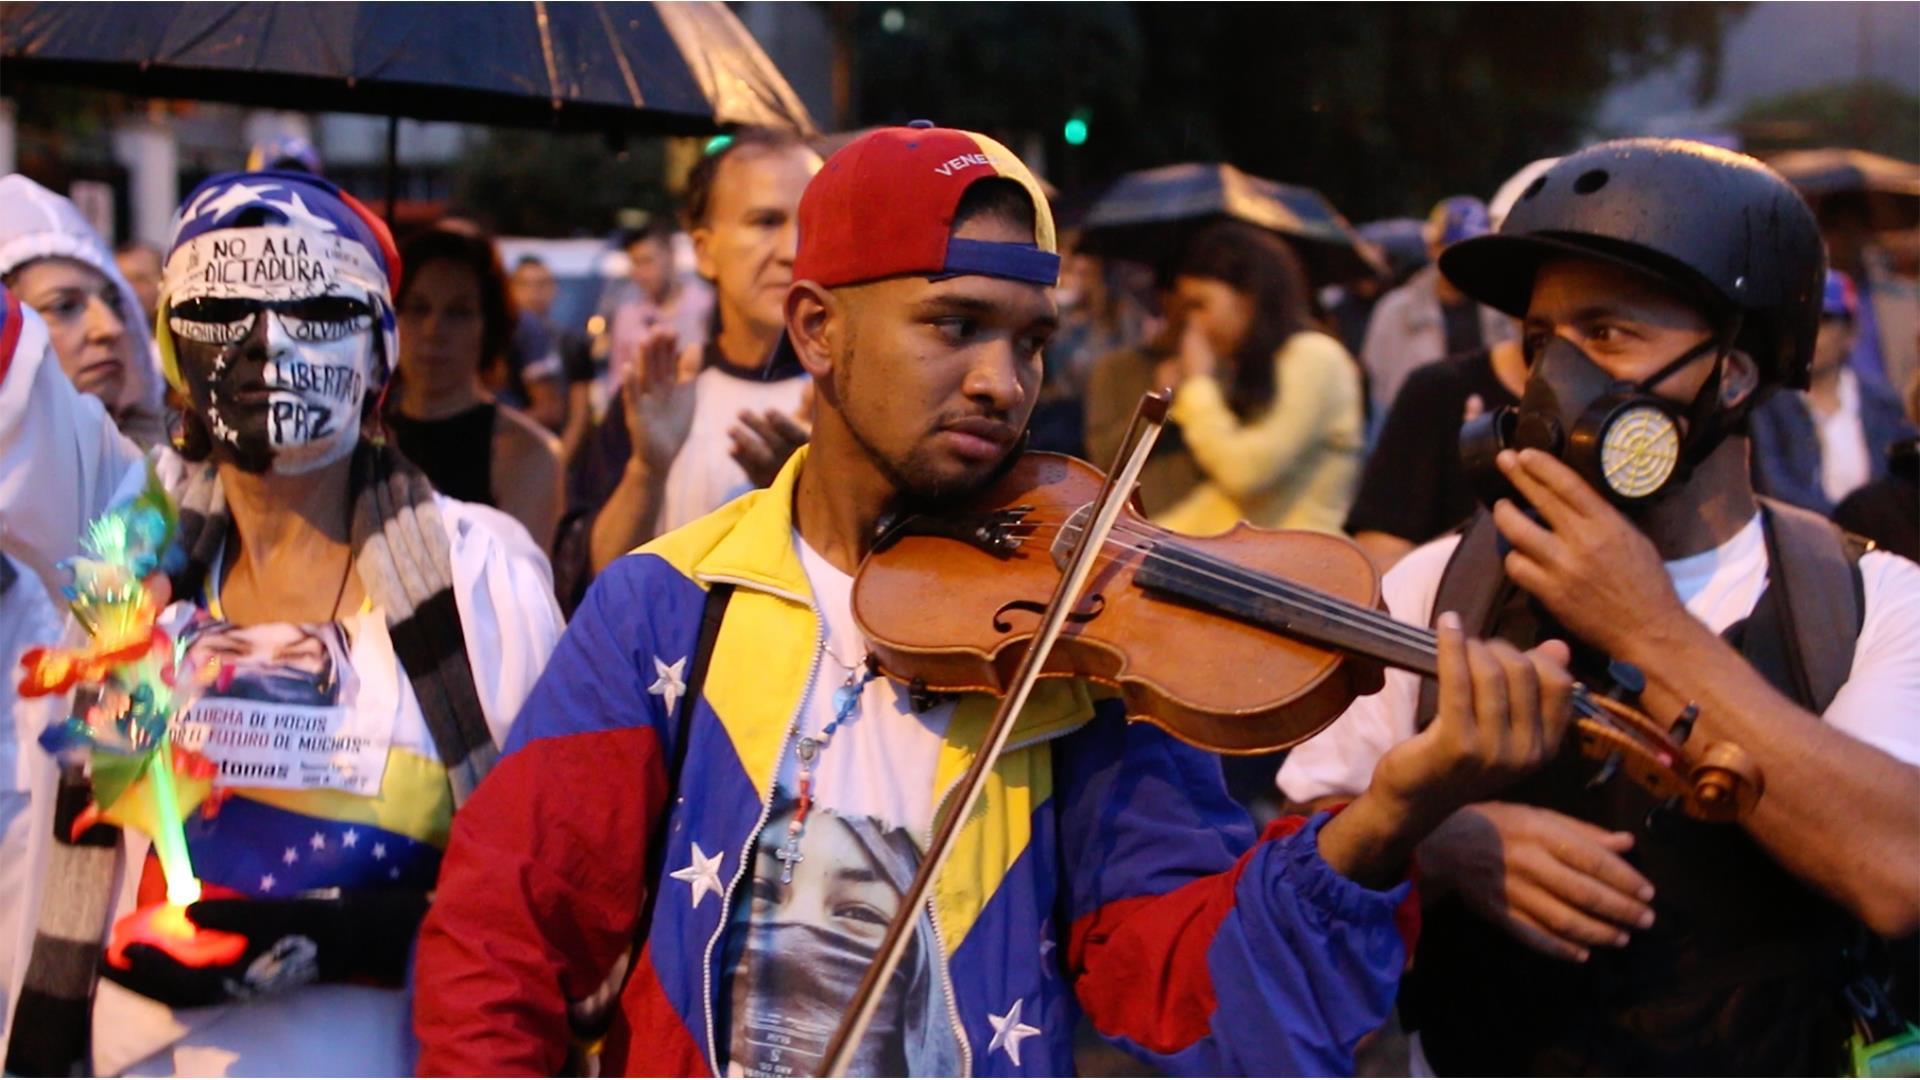 The long wait: Venezuelan violinist and resistance symbol seeks political asylum in U.S.